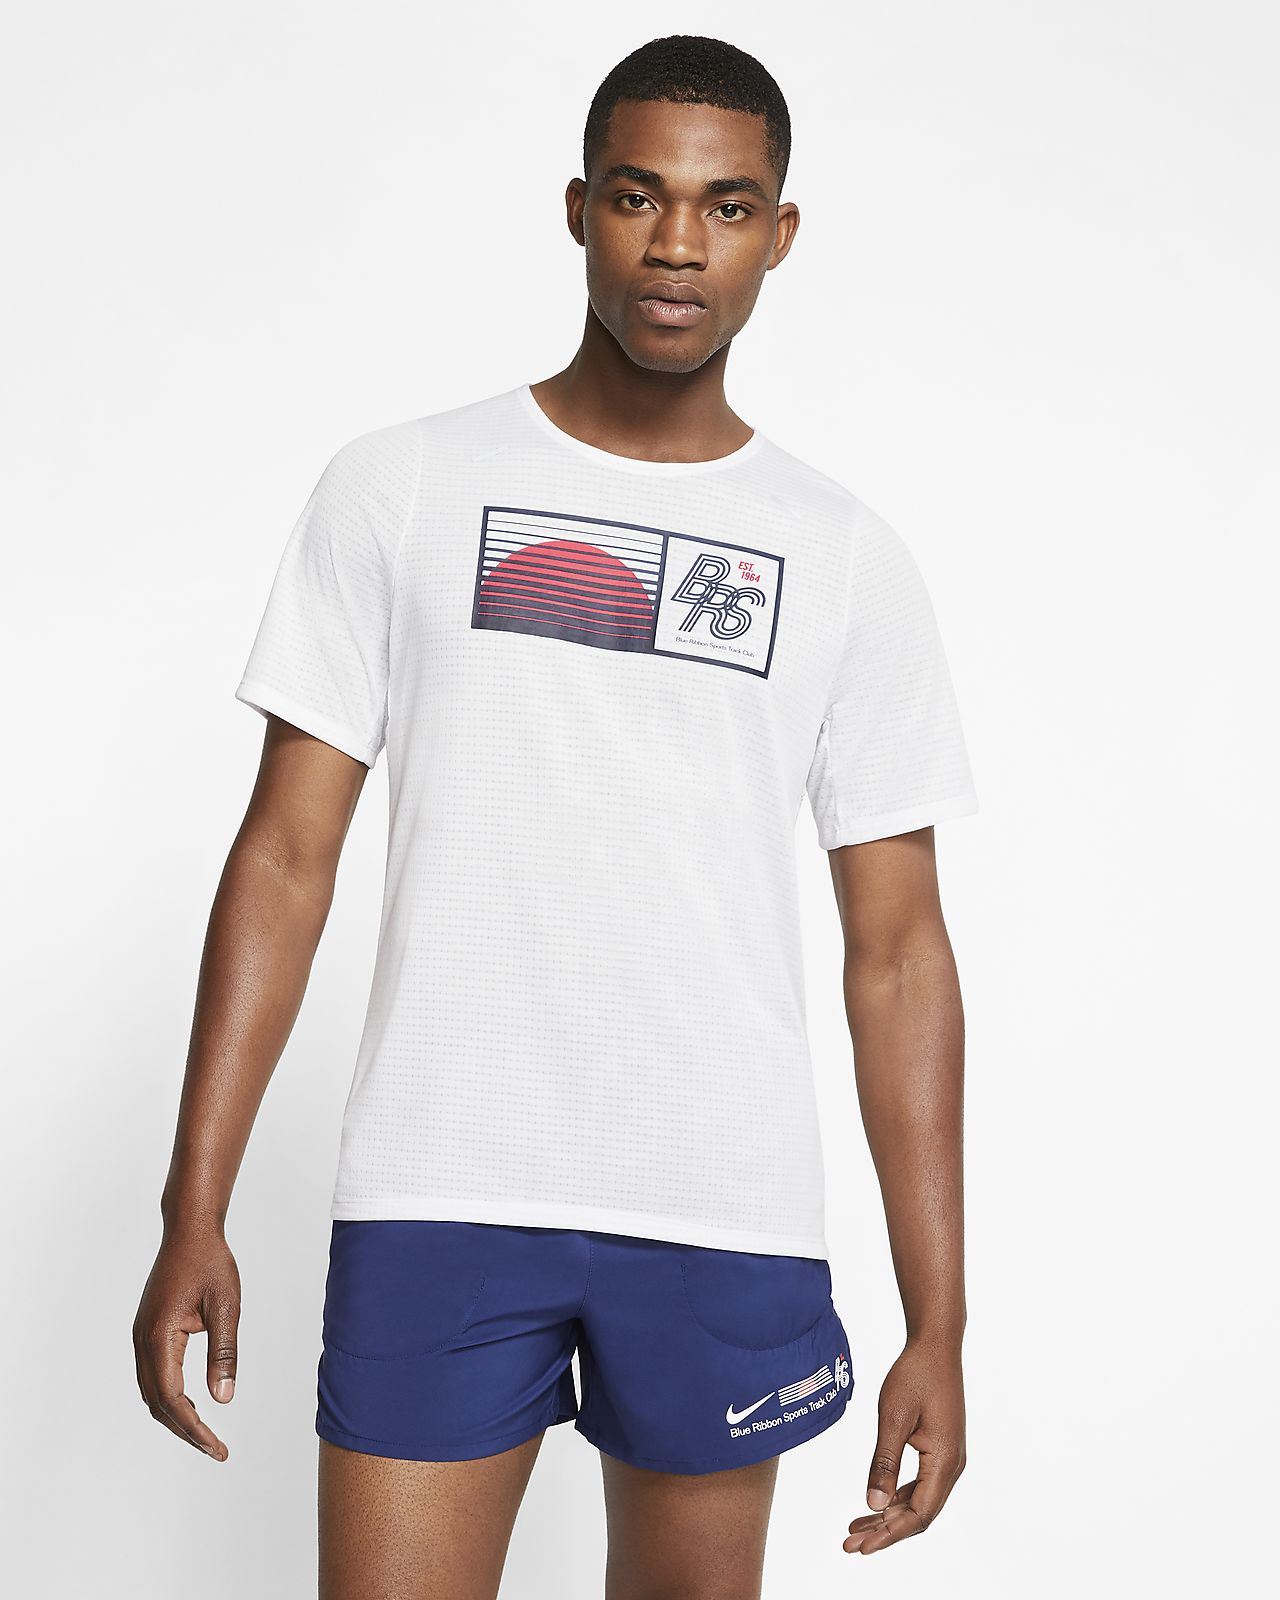 Nike Rise 365 Blue Ribbon Sports Men's Running Top